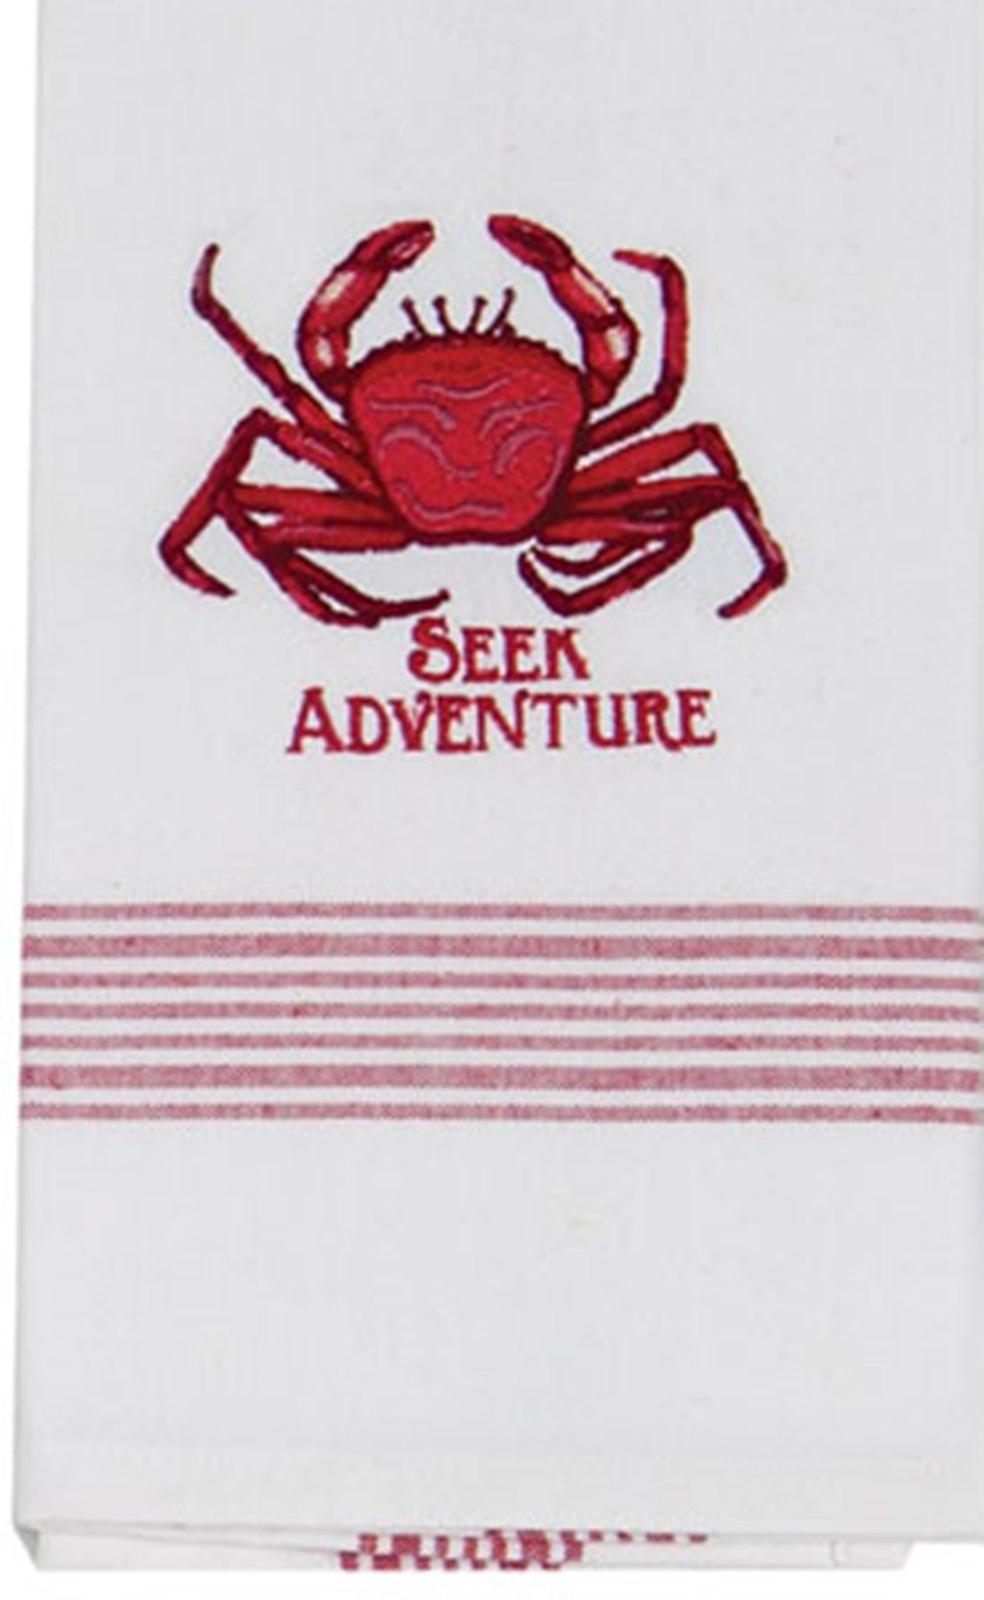 Crab Seek Adventure Coastal 28 Inch Embroidered Kitchen Tea Towel Cotton Kay Dee